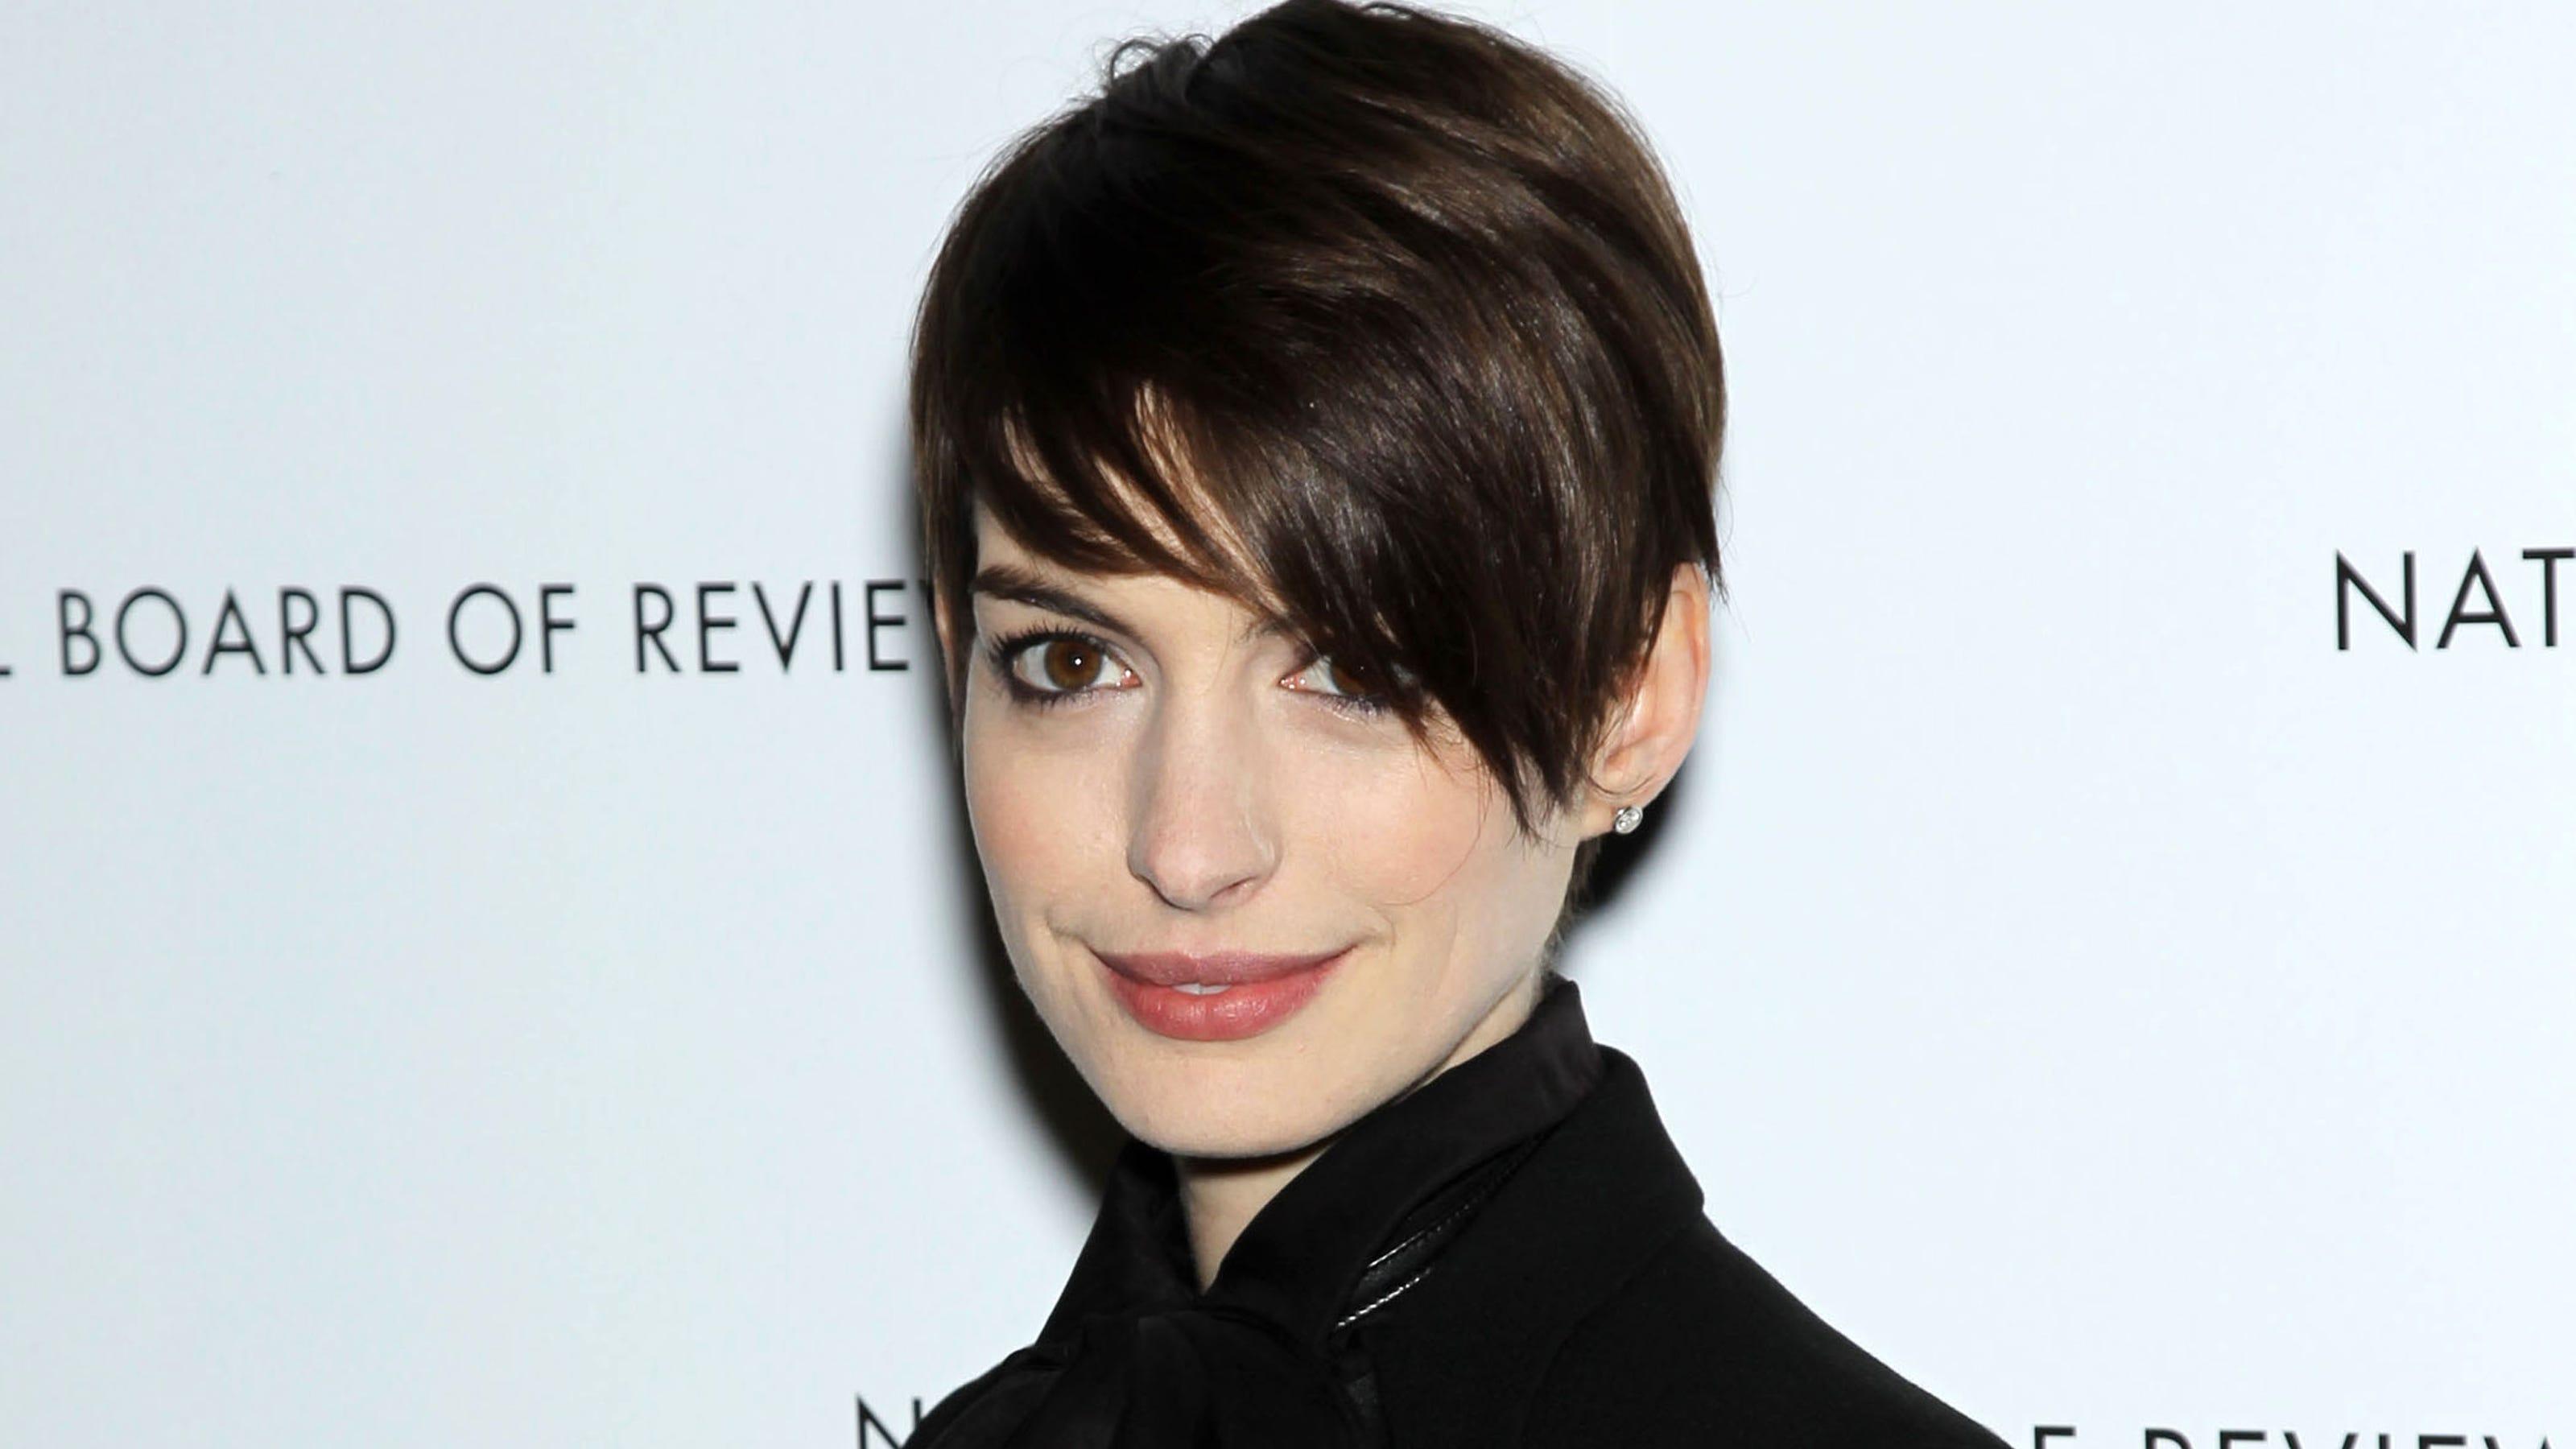 Oscars 2013: Argo Scores Best Picture Win